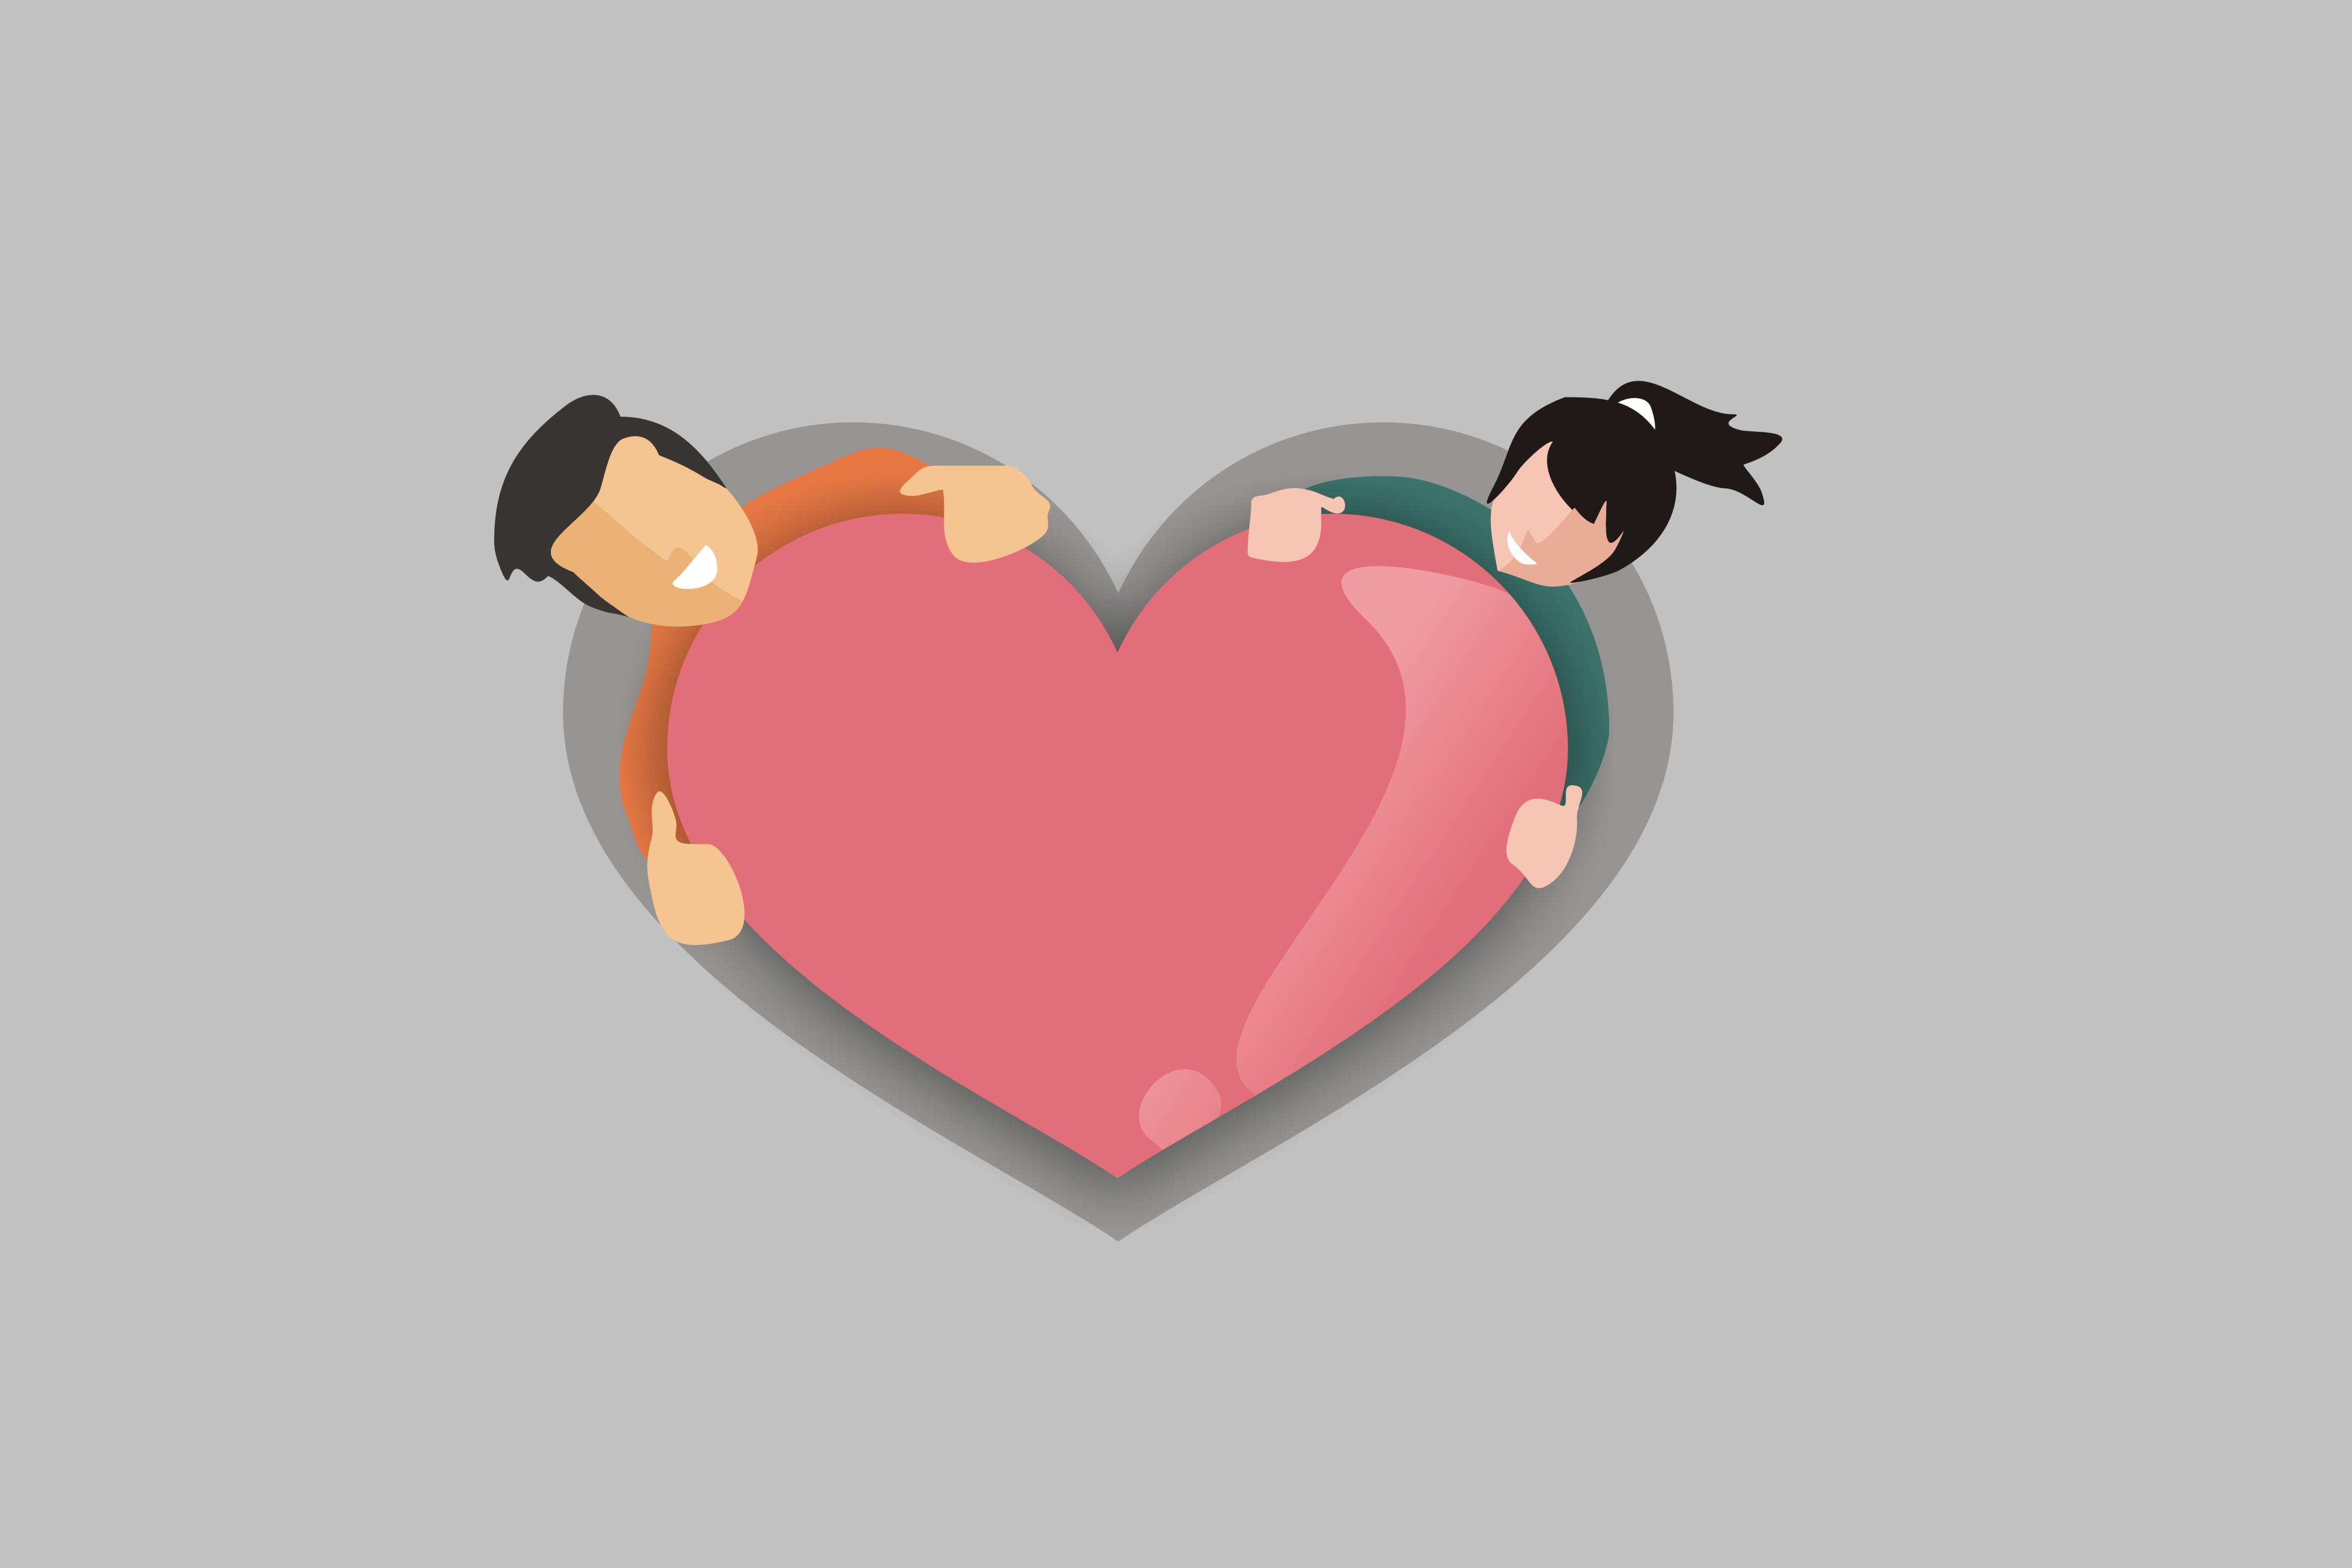 Deg-deganmu itu karena jatuh cinta atau cuma penasaran? Ini kata pakar